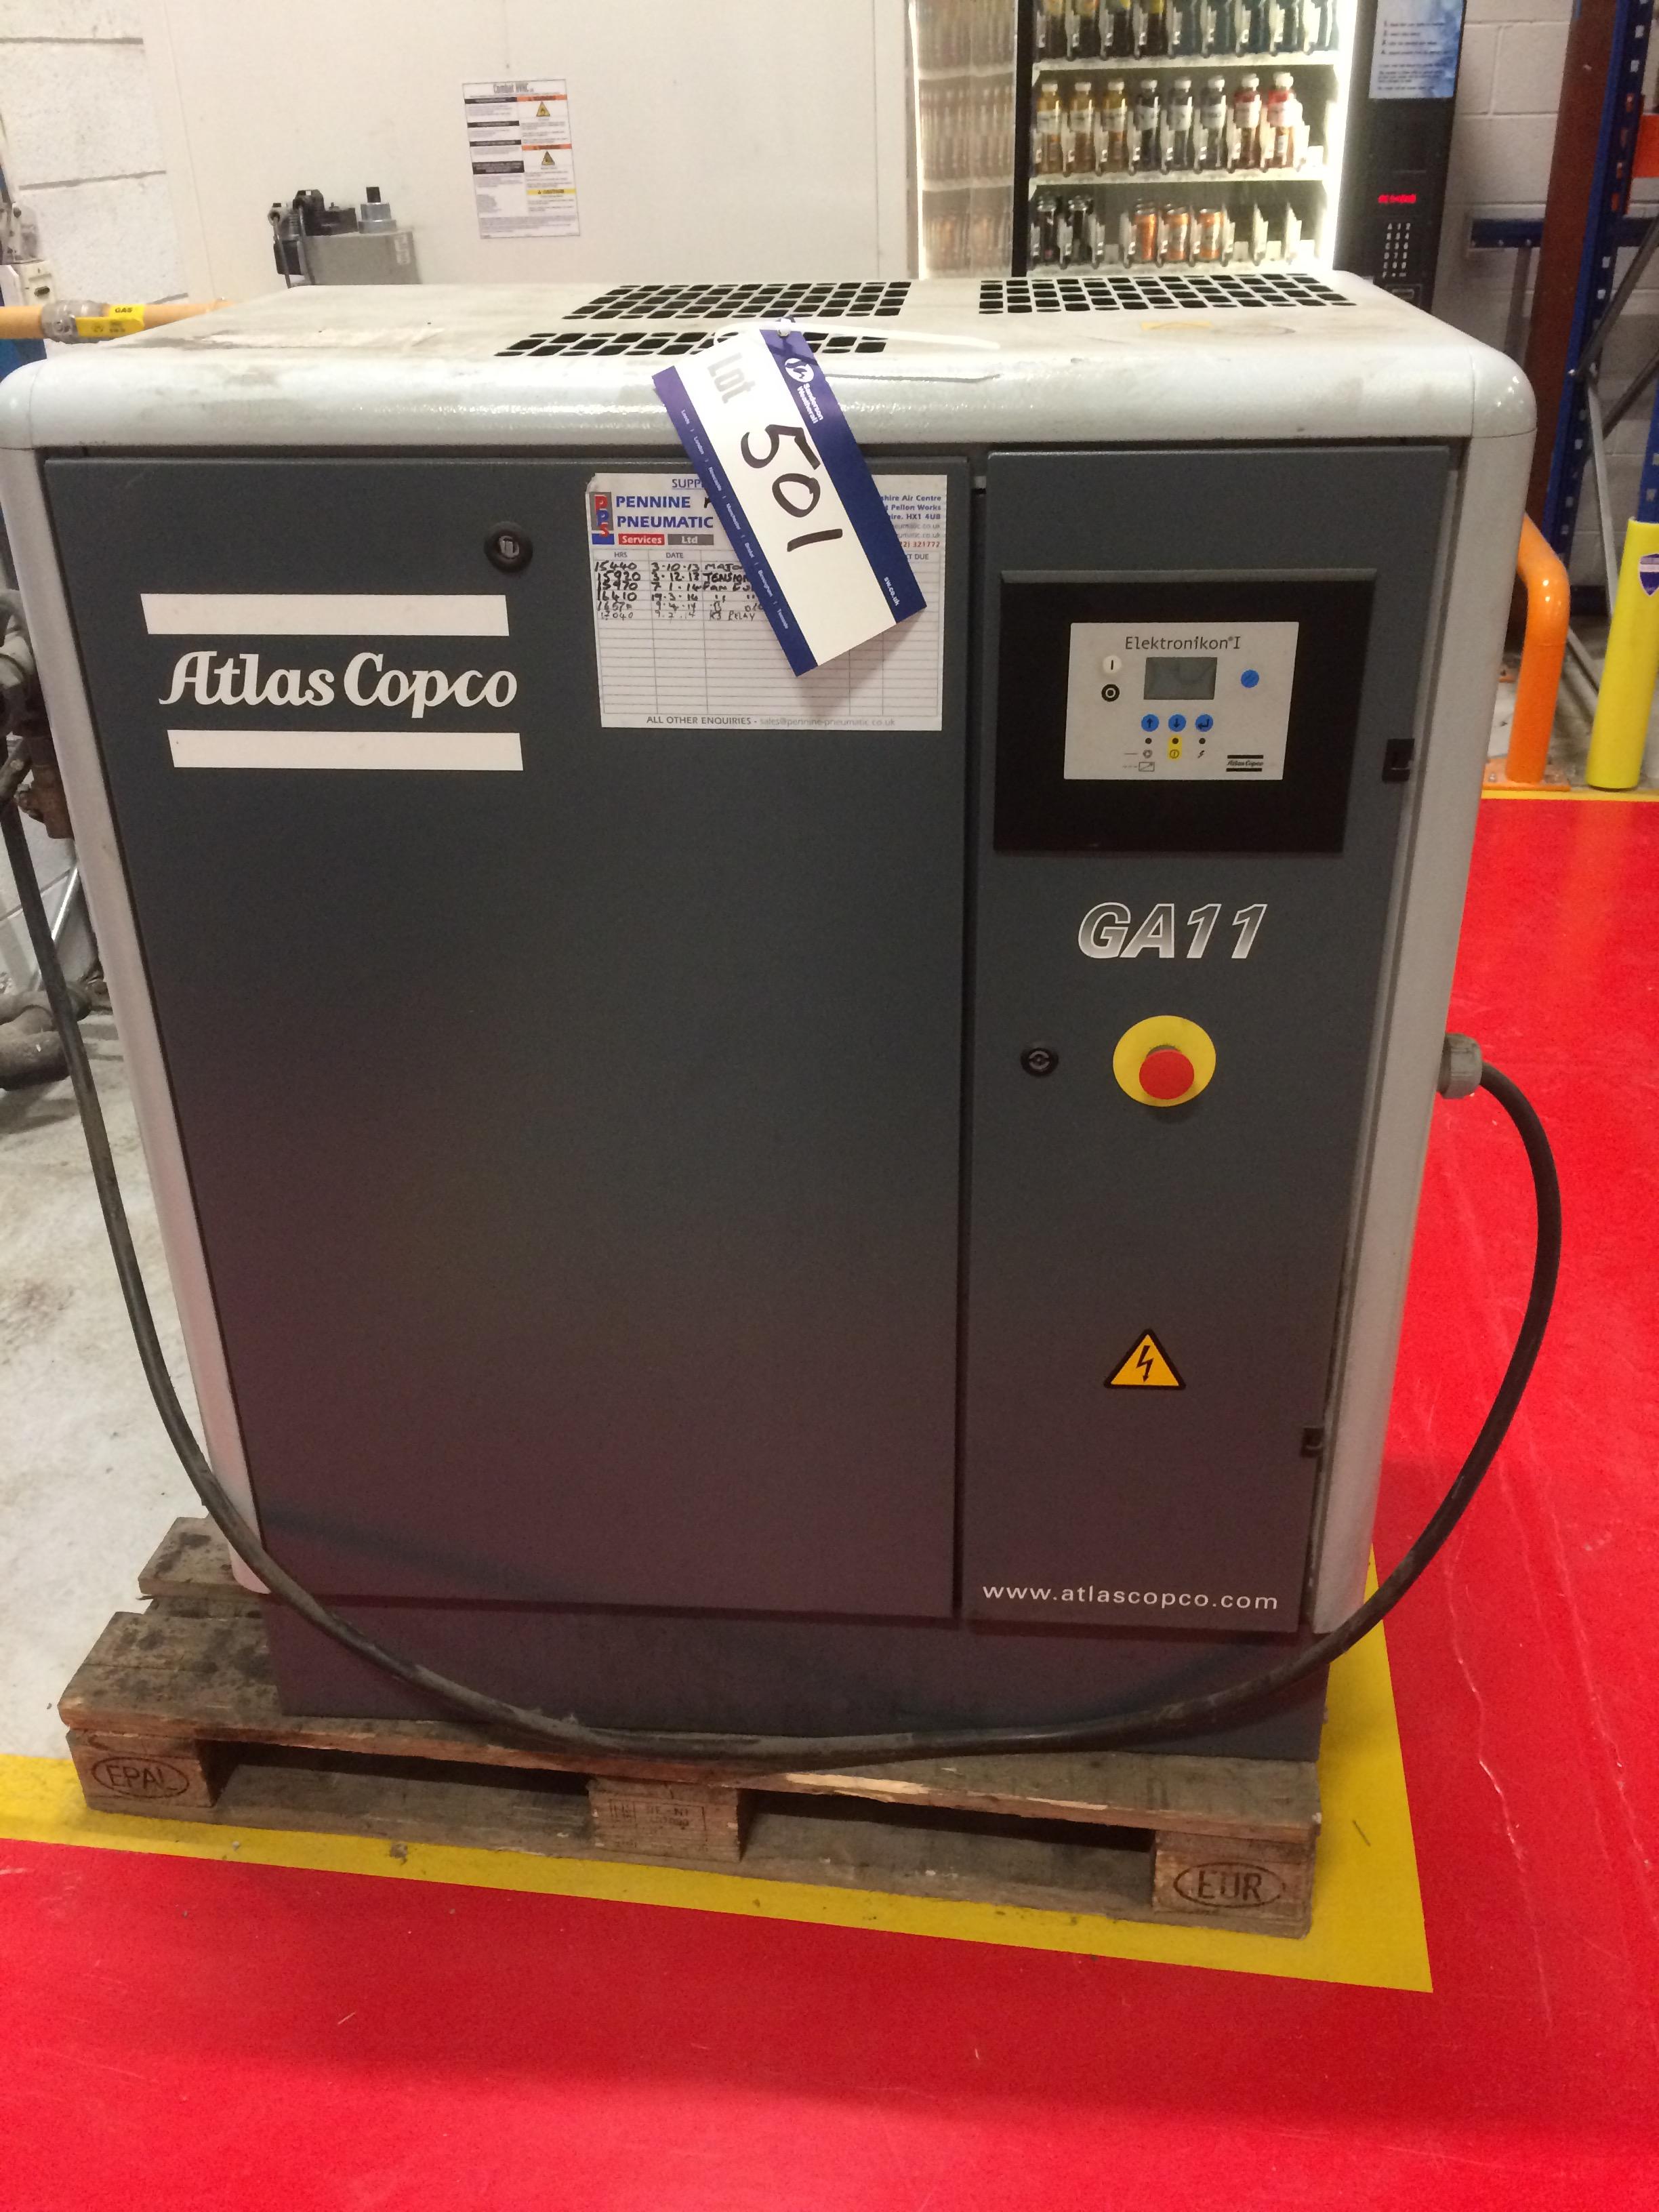 ATLAS COPCO DM45 For Sale - 3 Listings | MachineryTrader ...